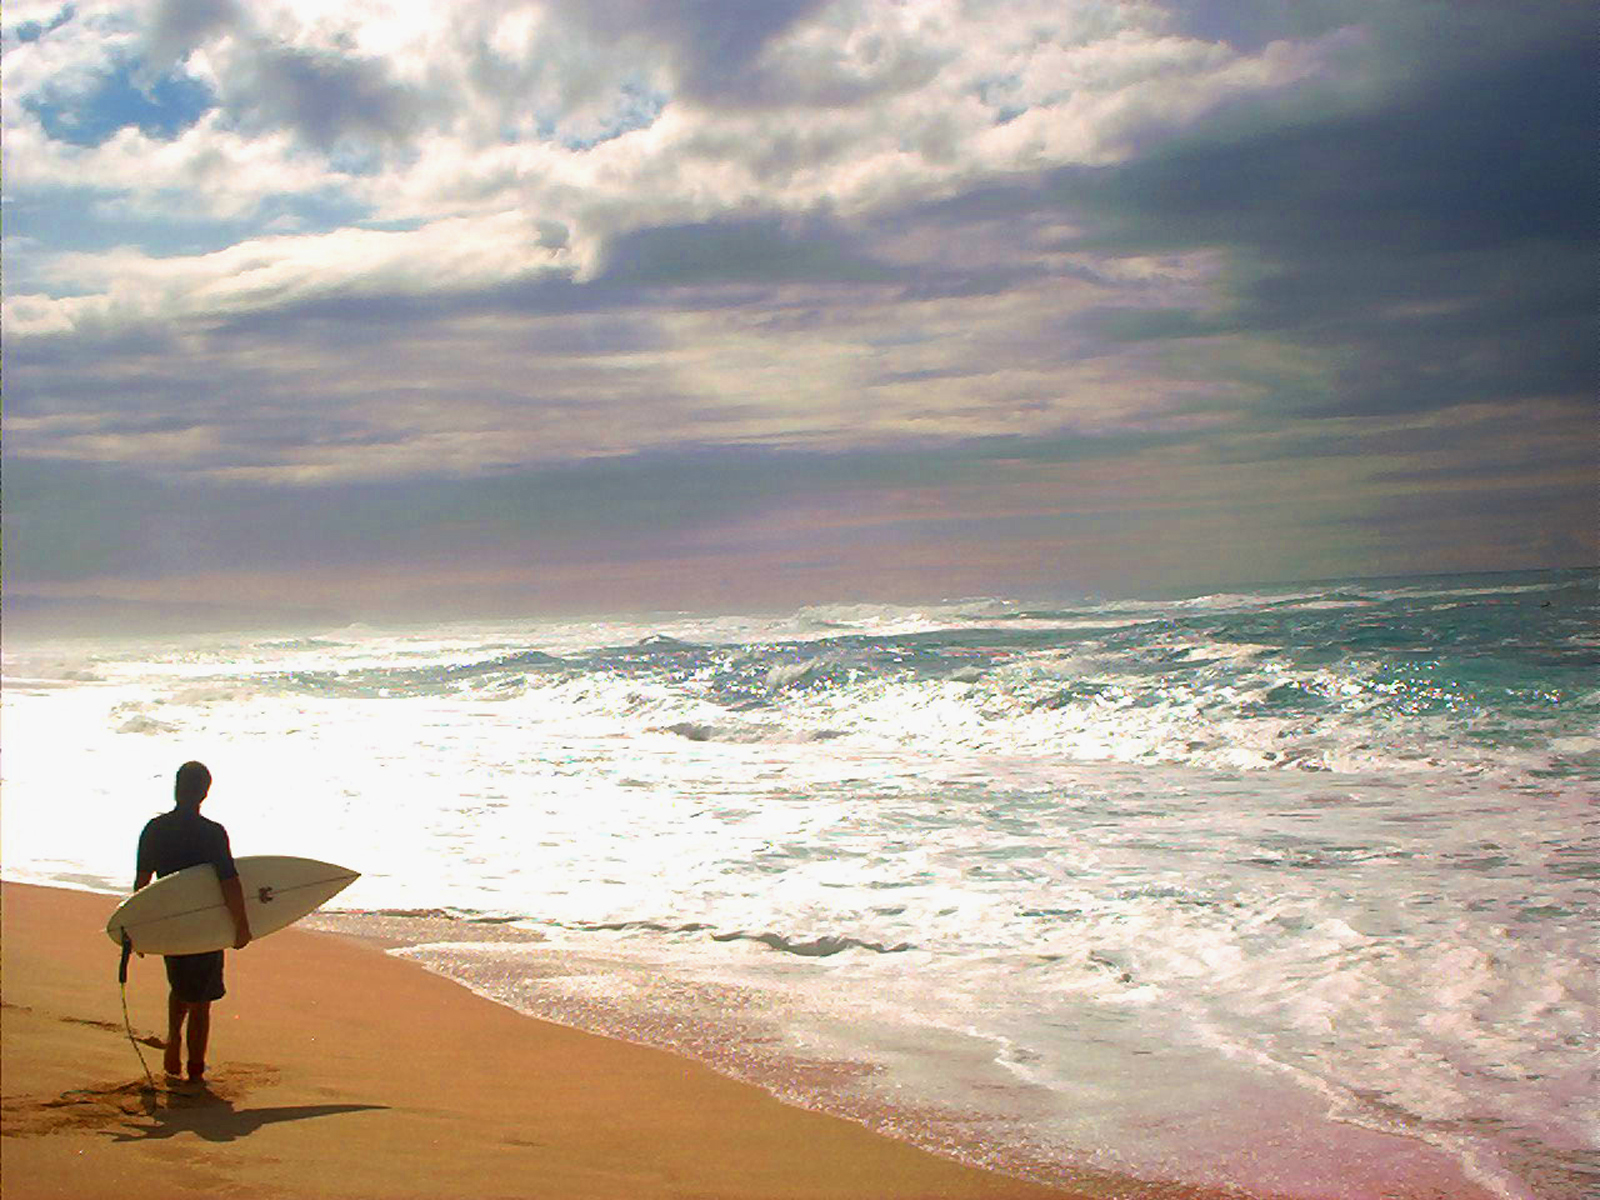 Sunset Beach Surfer, Beach, Board, Bspo06, Guy, HQ Photo